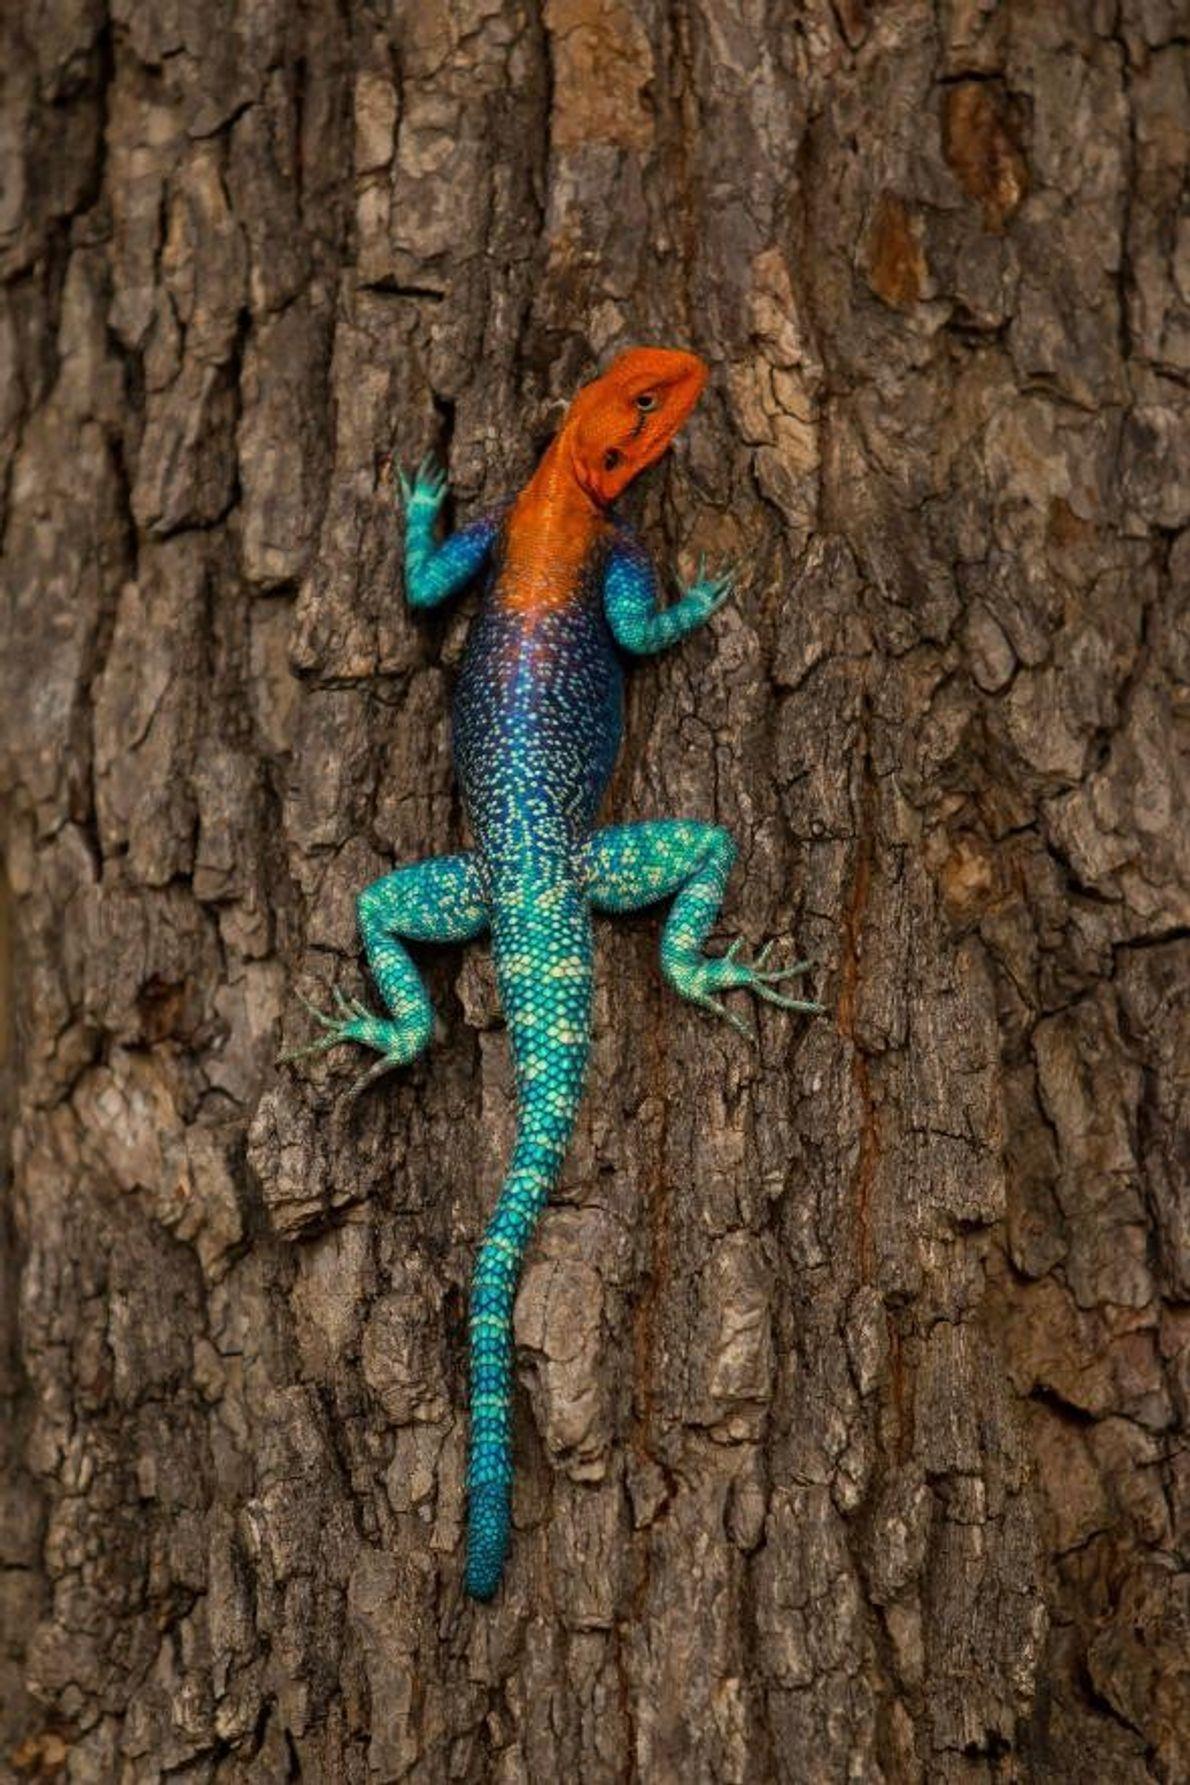 Lézard Agama, parc national de Ruaha, région de Morogoro, Tanzanie.